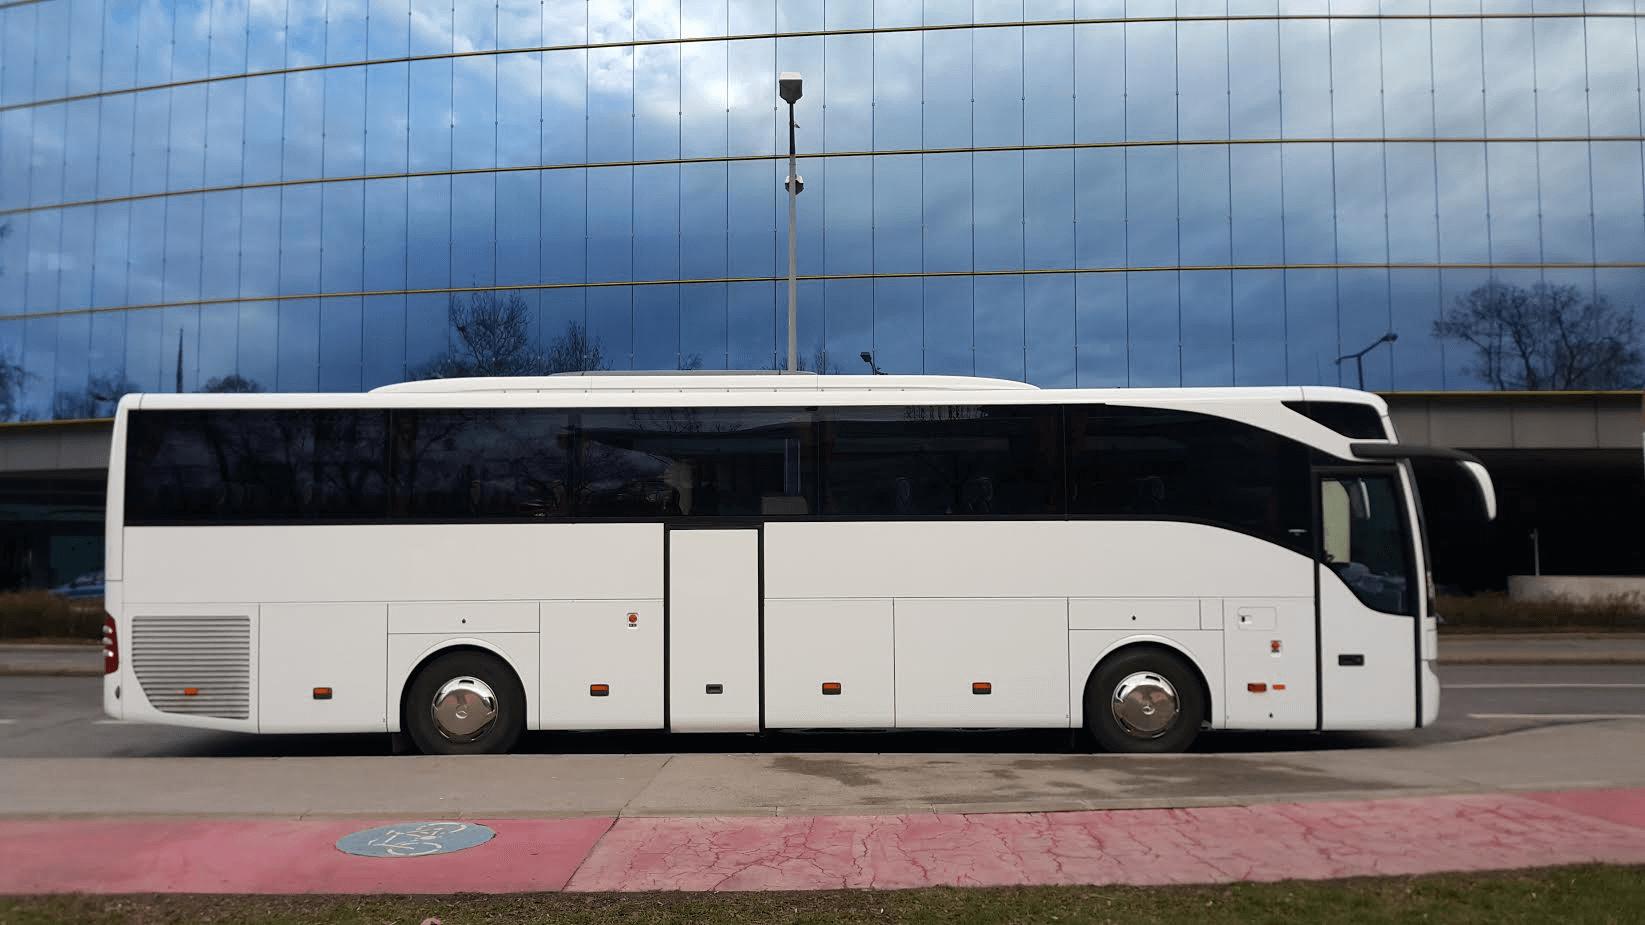 MB-2017-1-1